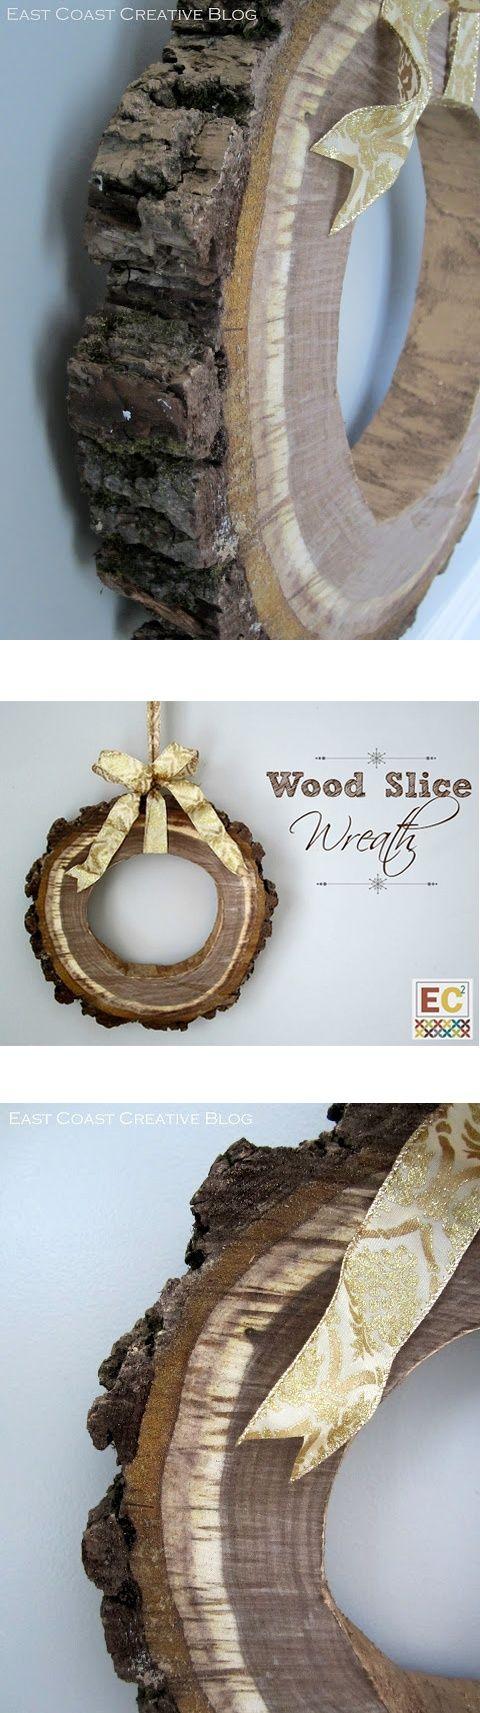 DIY Christmas Wreath from Wood - Popular DIY & Crafts Pins on Pinterest